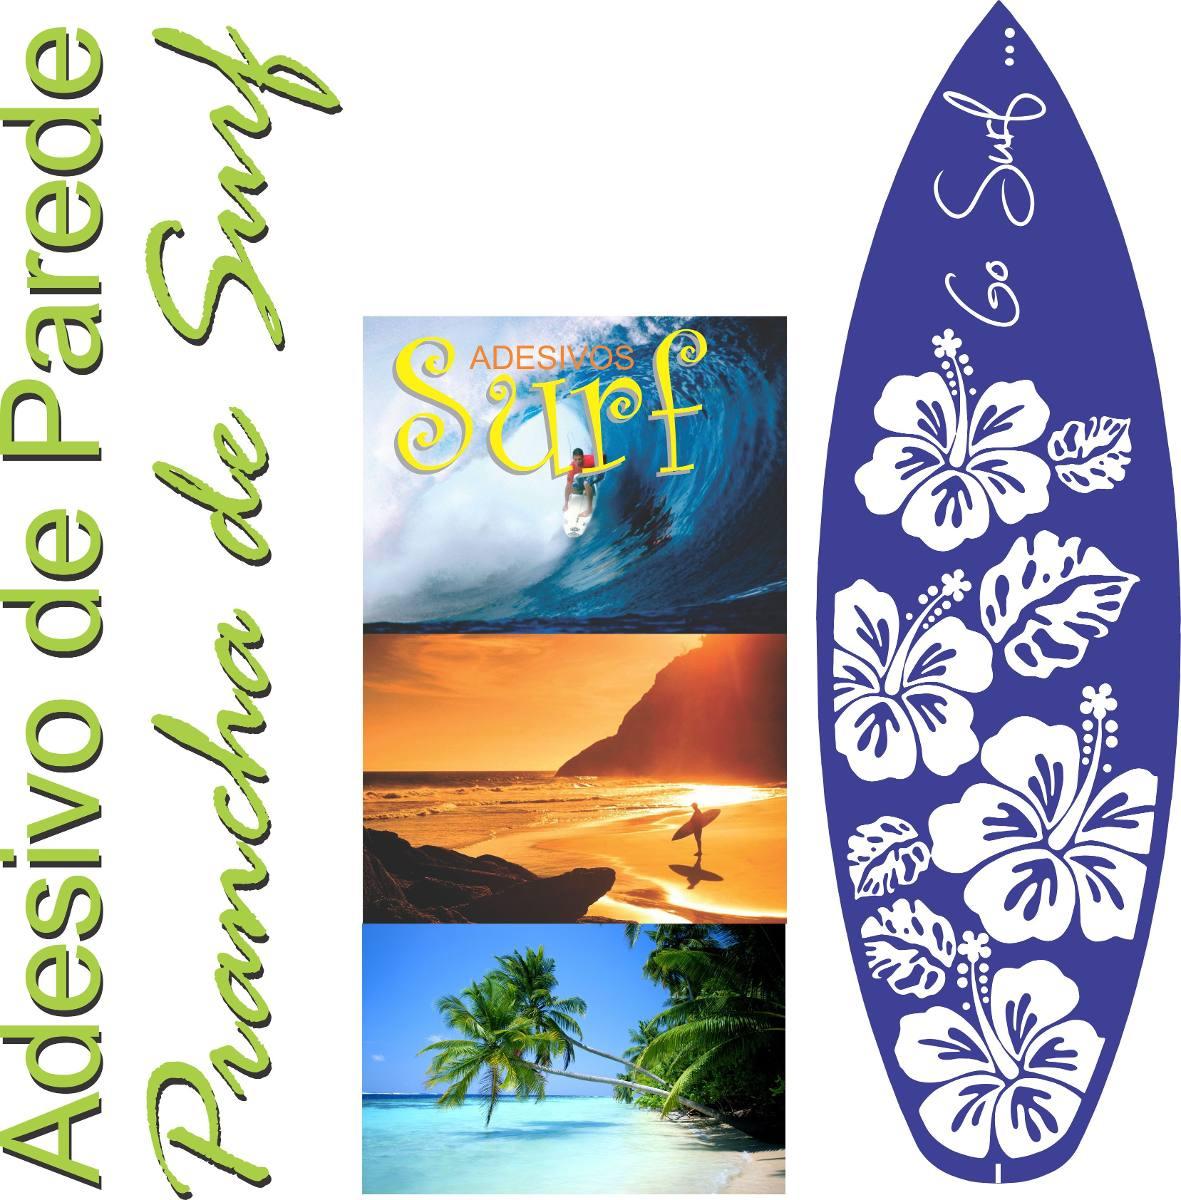 eadfcb75c Adesivo Parede Prancha Surf Gigante 1